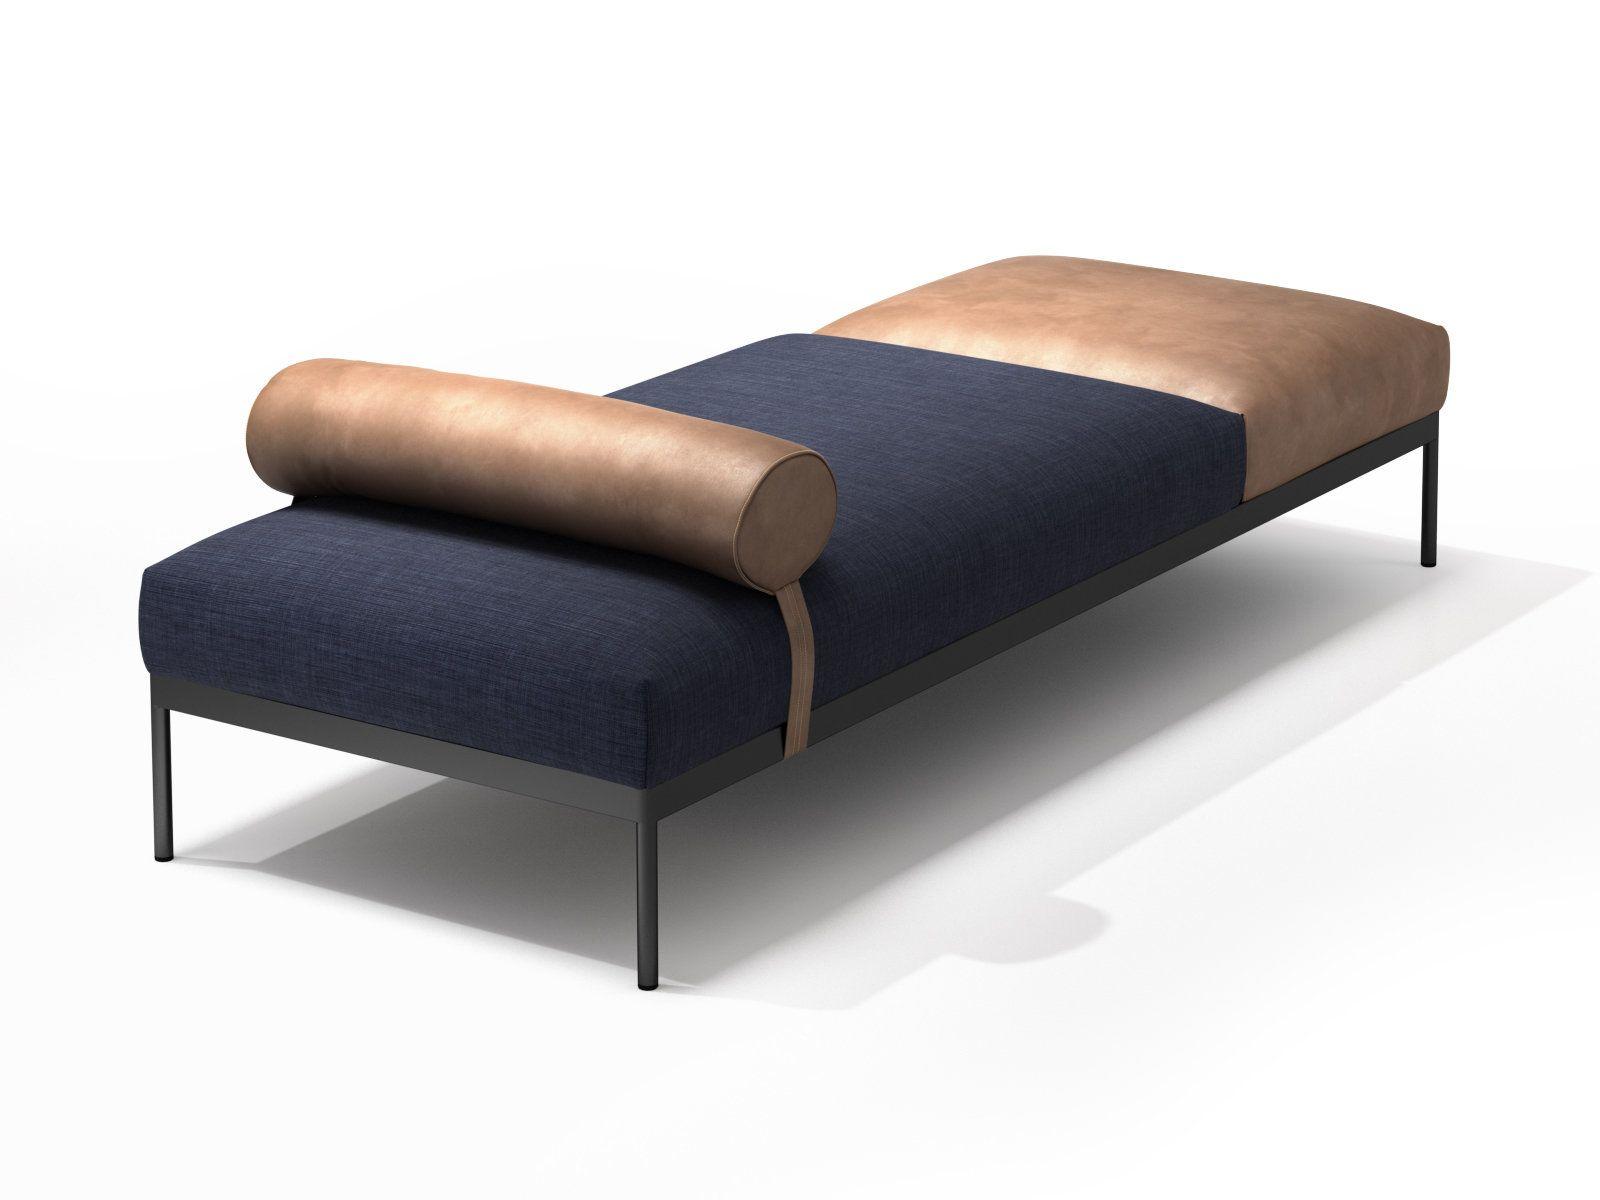 Best 25 Sofa design ideas on Pinterest